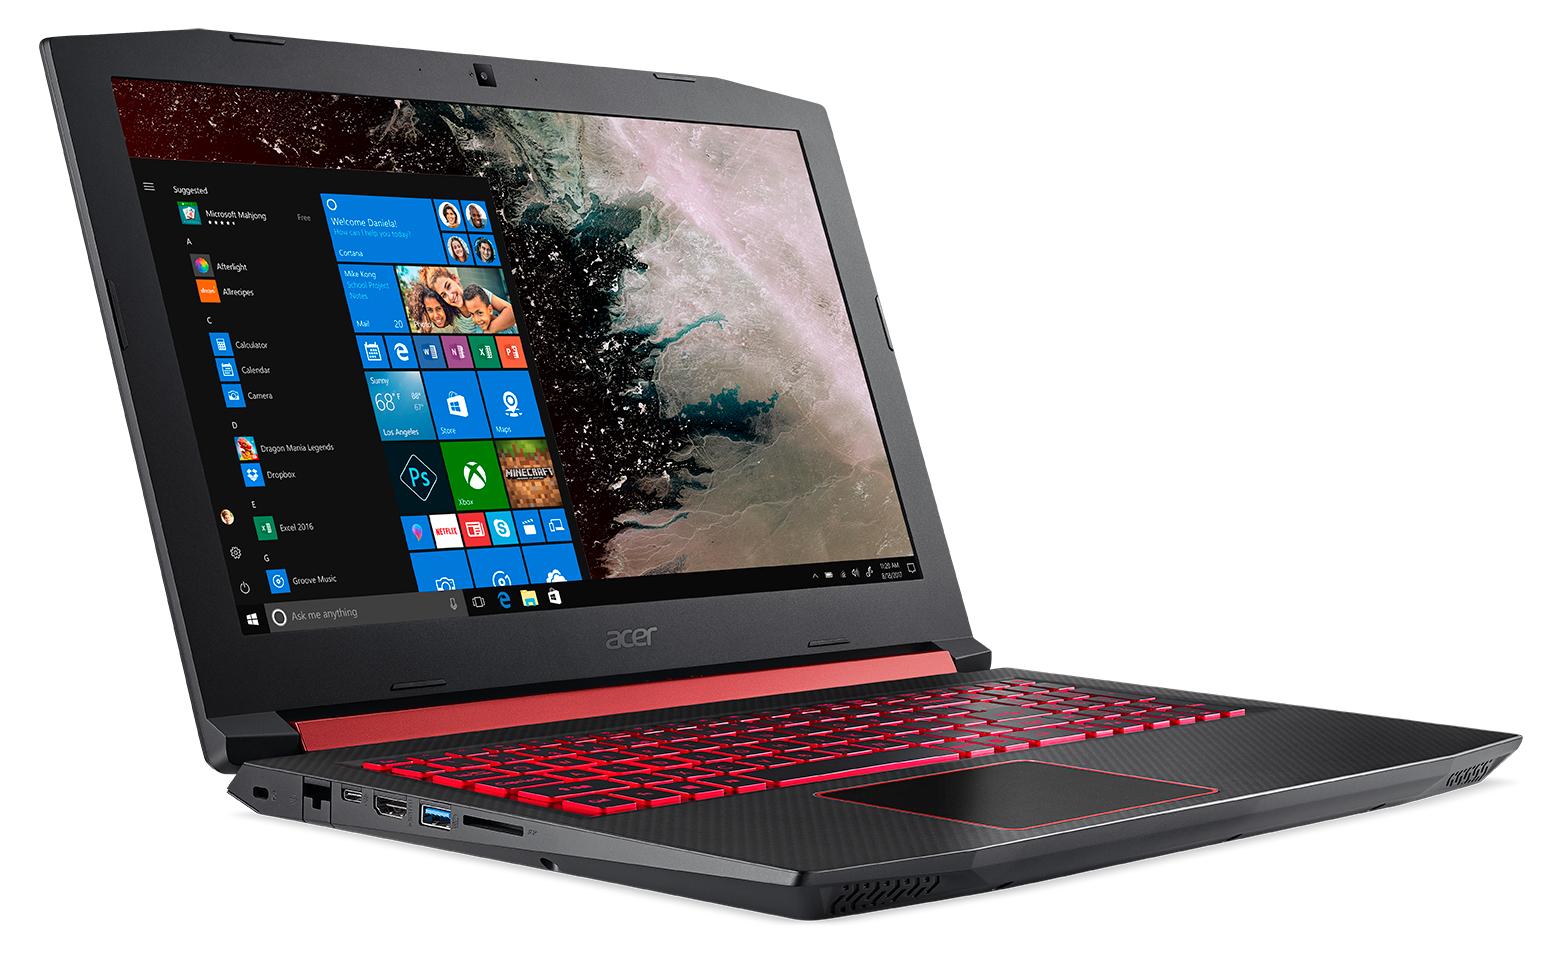 Acer Unveils The Nitro 5 Ryzen-Based Laptop - Legit